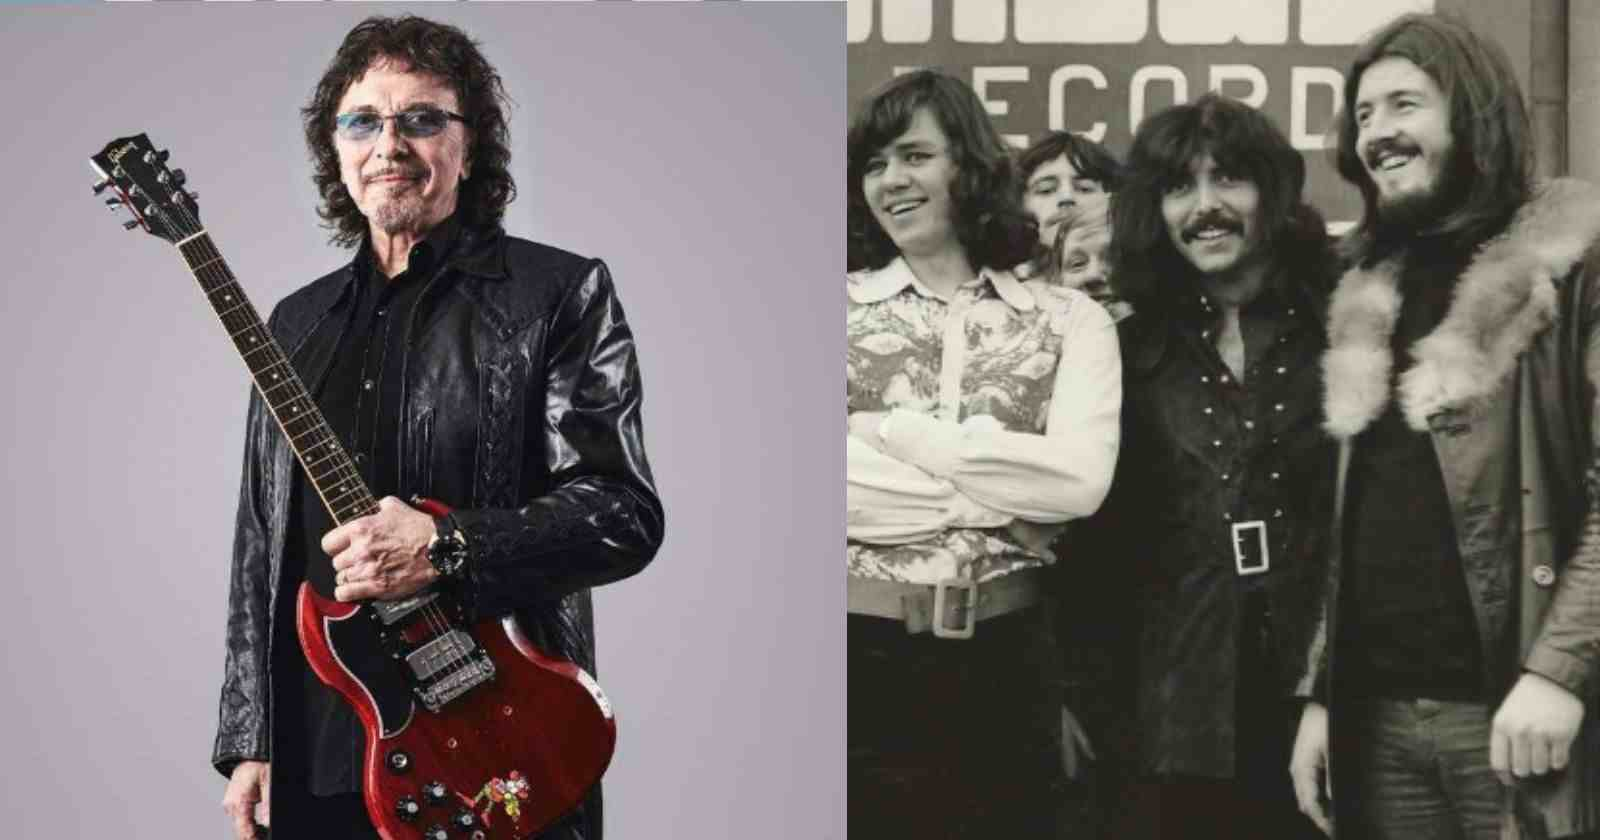 Tony Iommi John Bonham